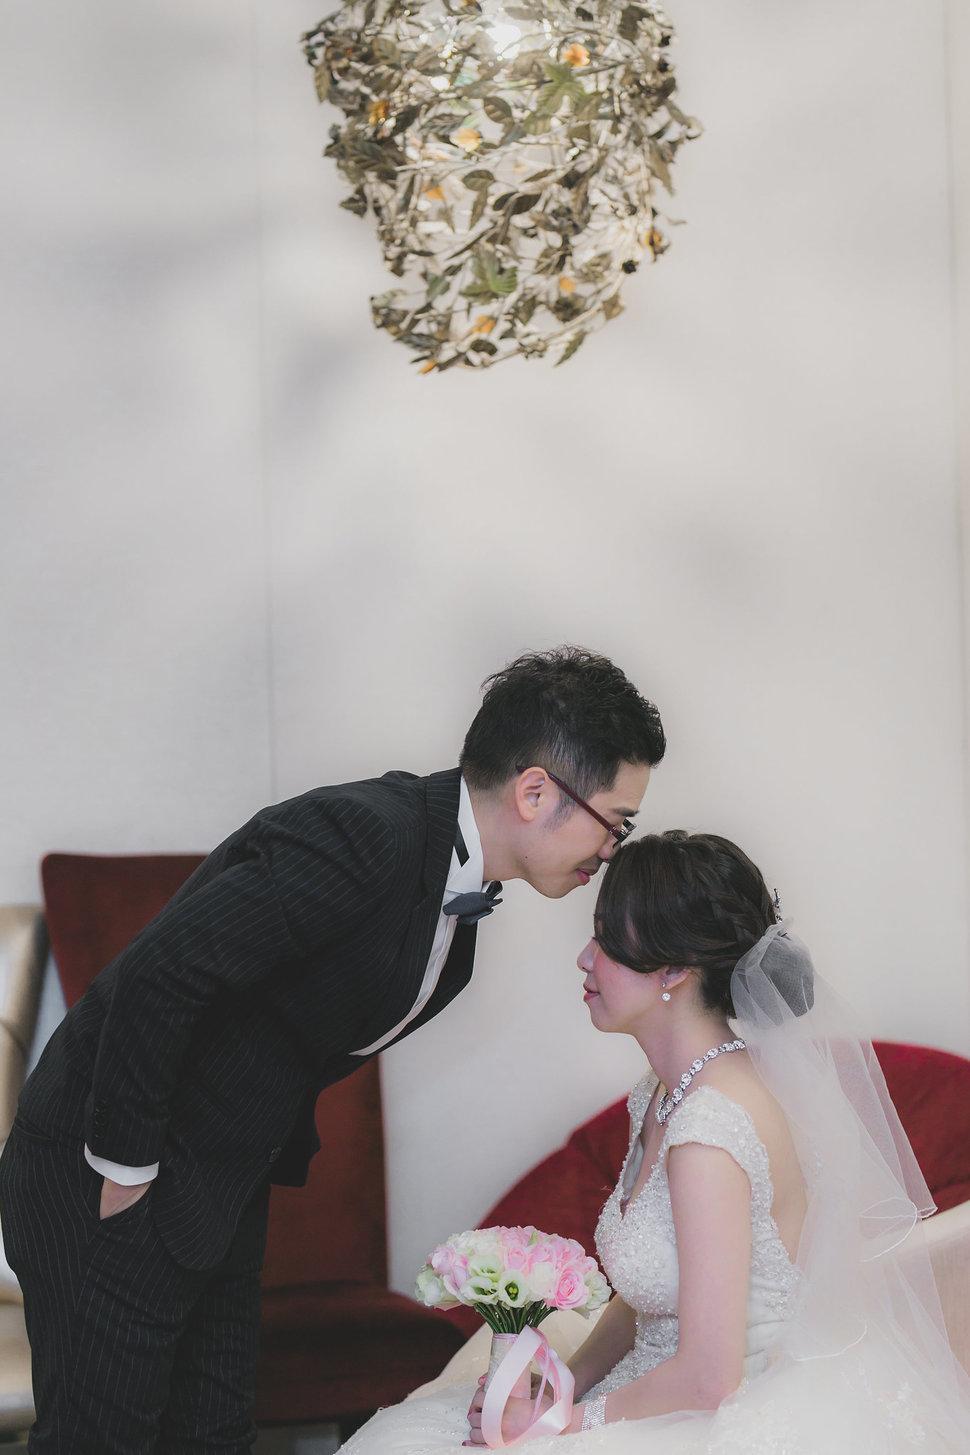 48343571096_251b8f8da2_k - J Photographer《結婚吧》